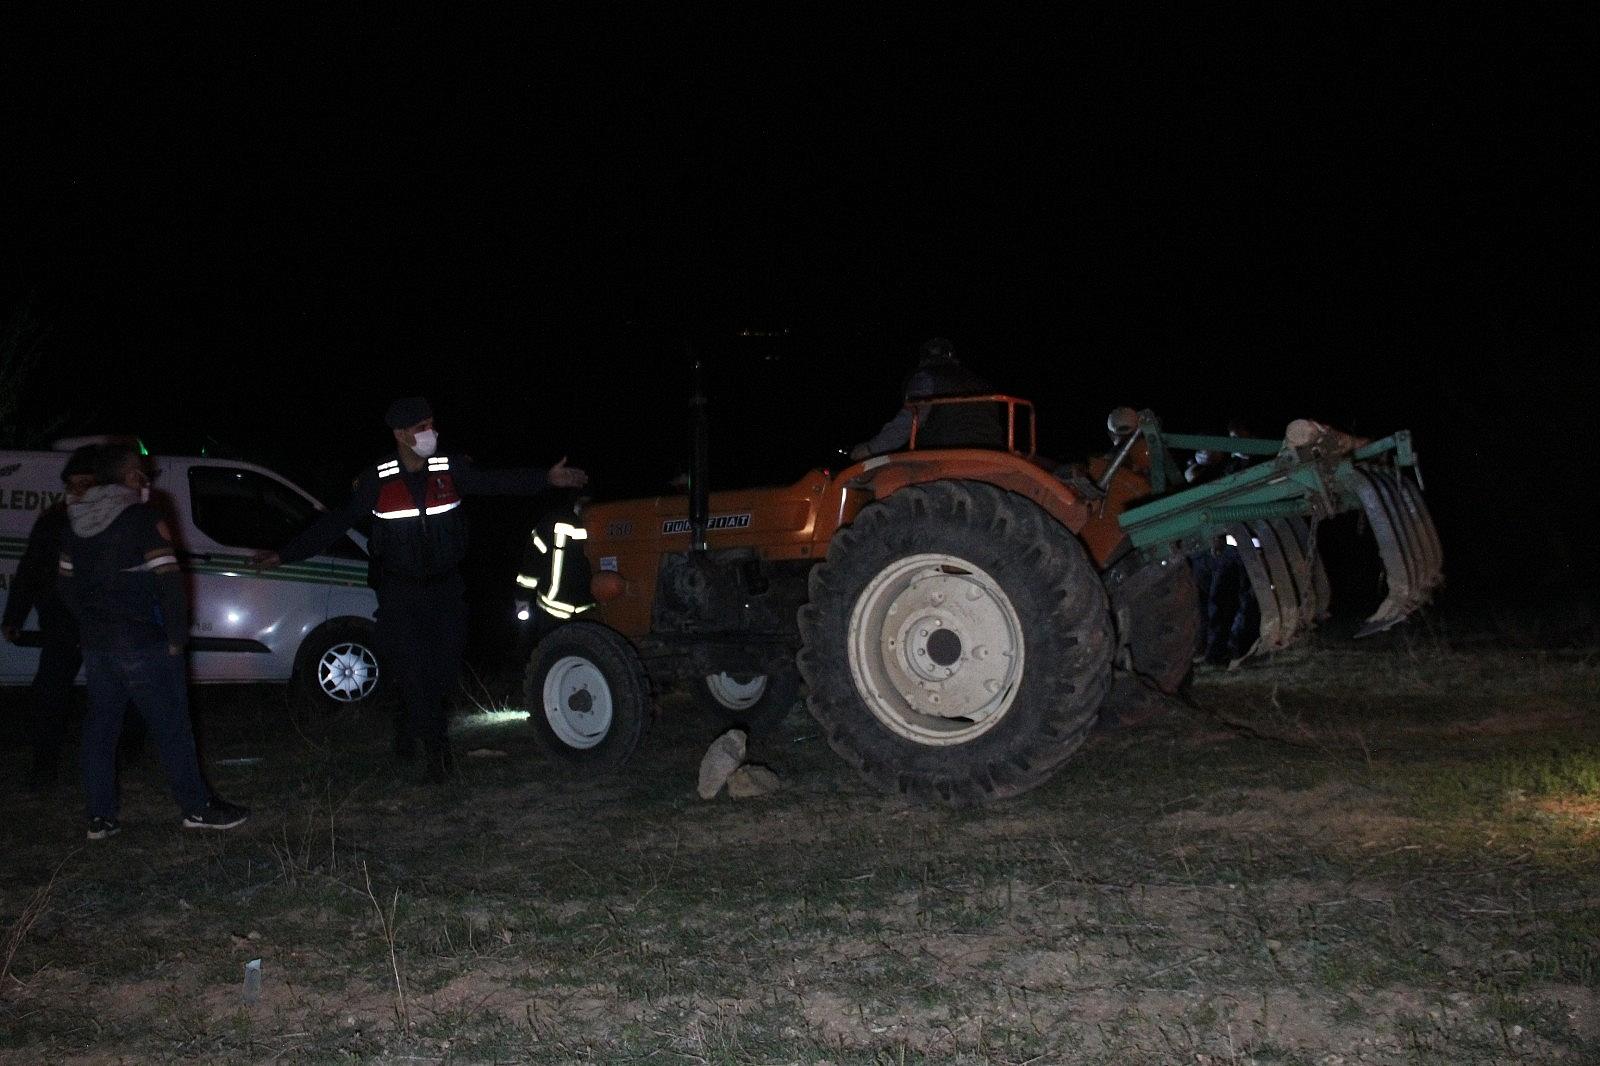 2021/04/karamanda-traktorun-altinda-kalan-ciftci-hayatini-kaybetti-20210421AW30-8.jpg